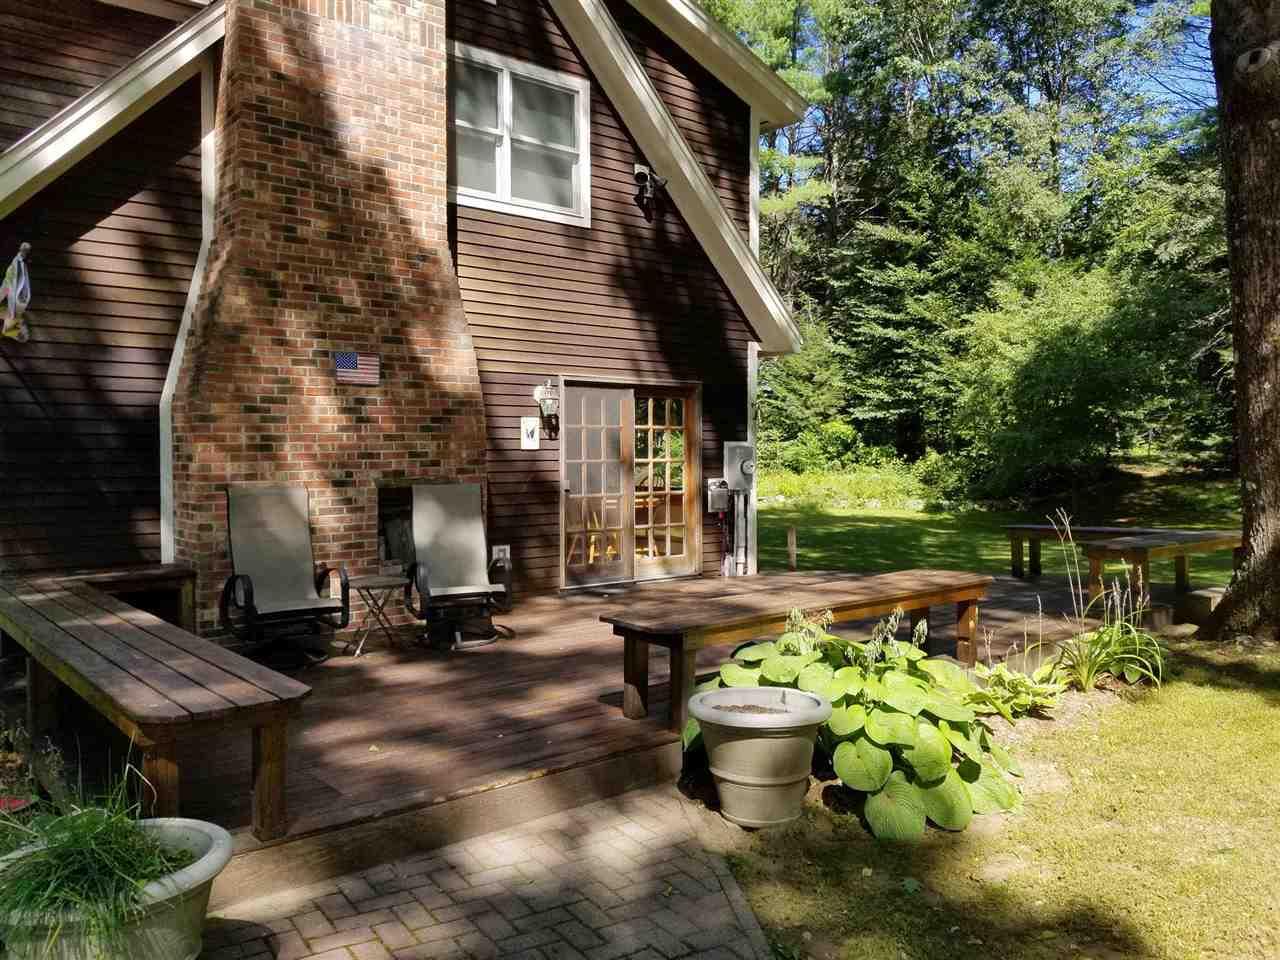 Mount-Snow-Real-Estate-4616205-3